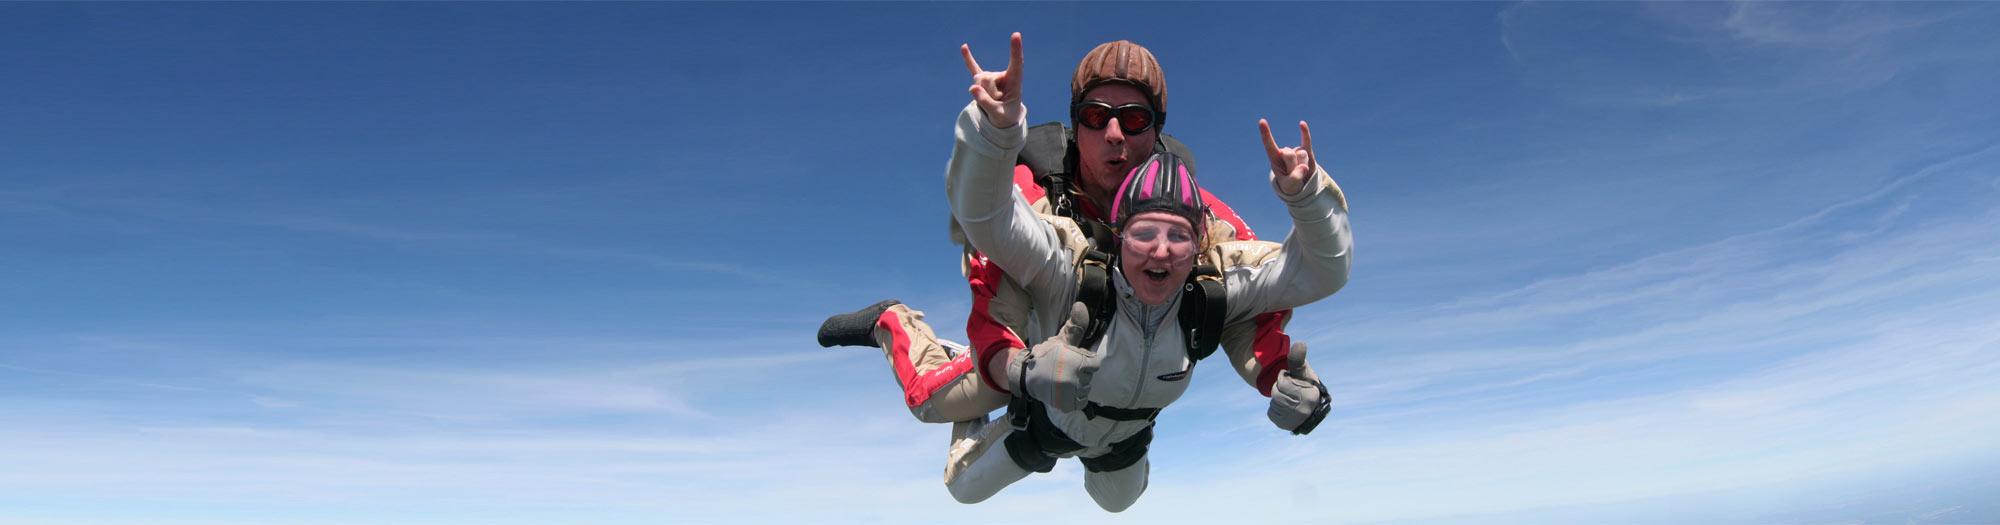 Fallschirmspringen bei skydive colibri